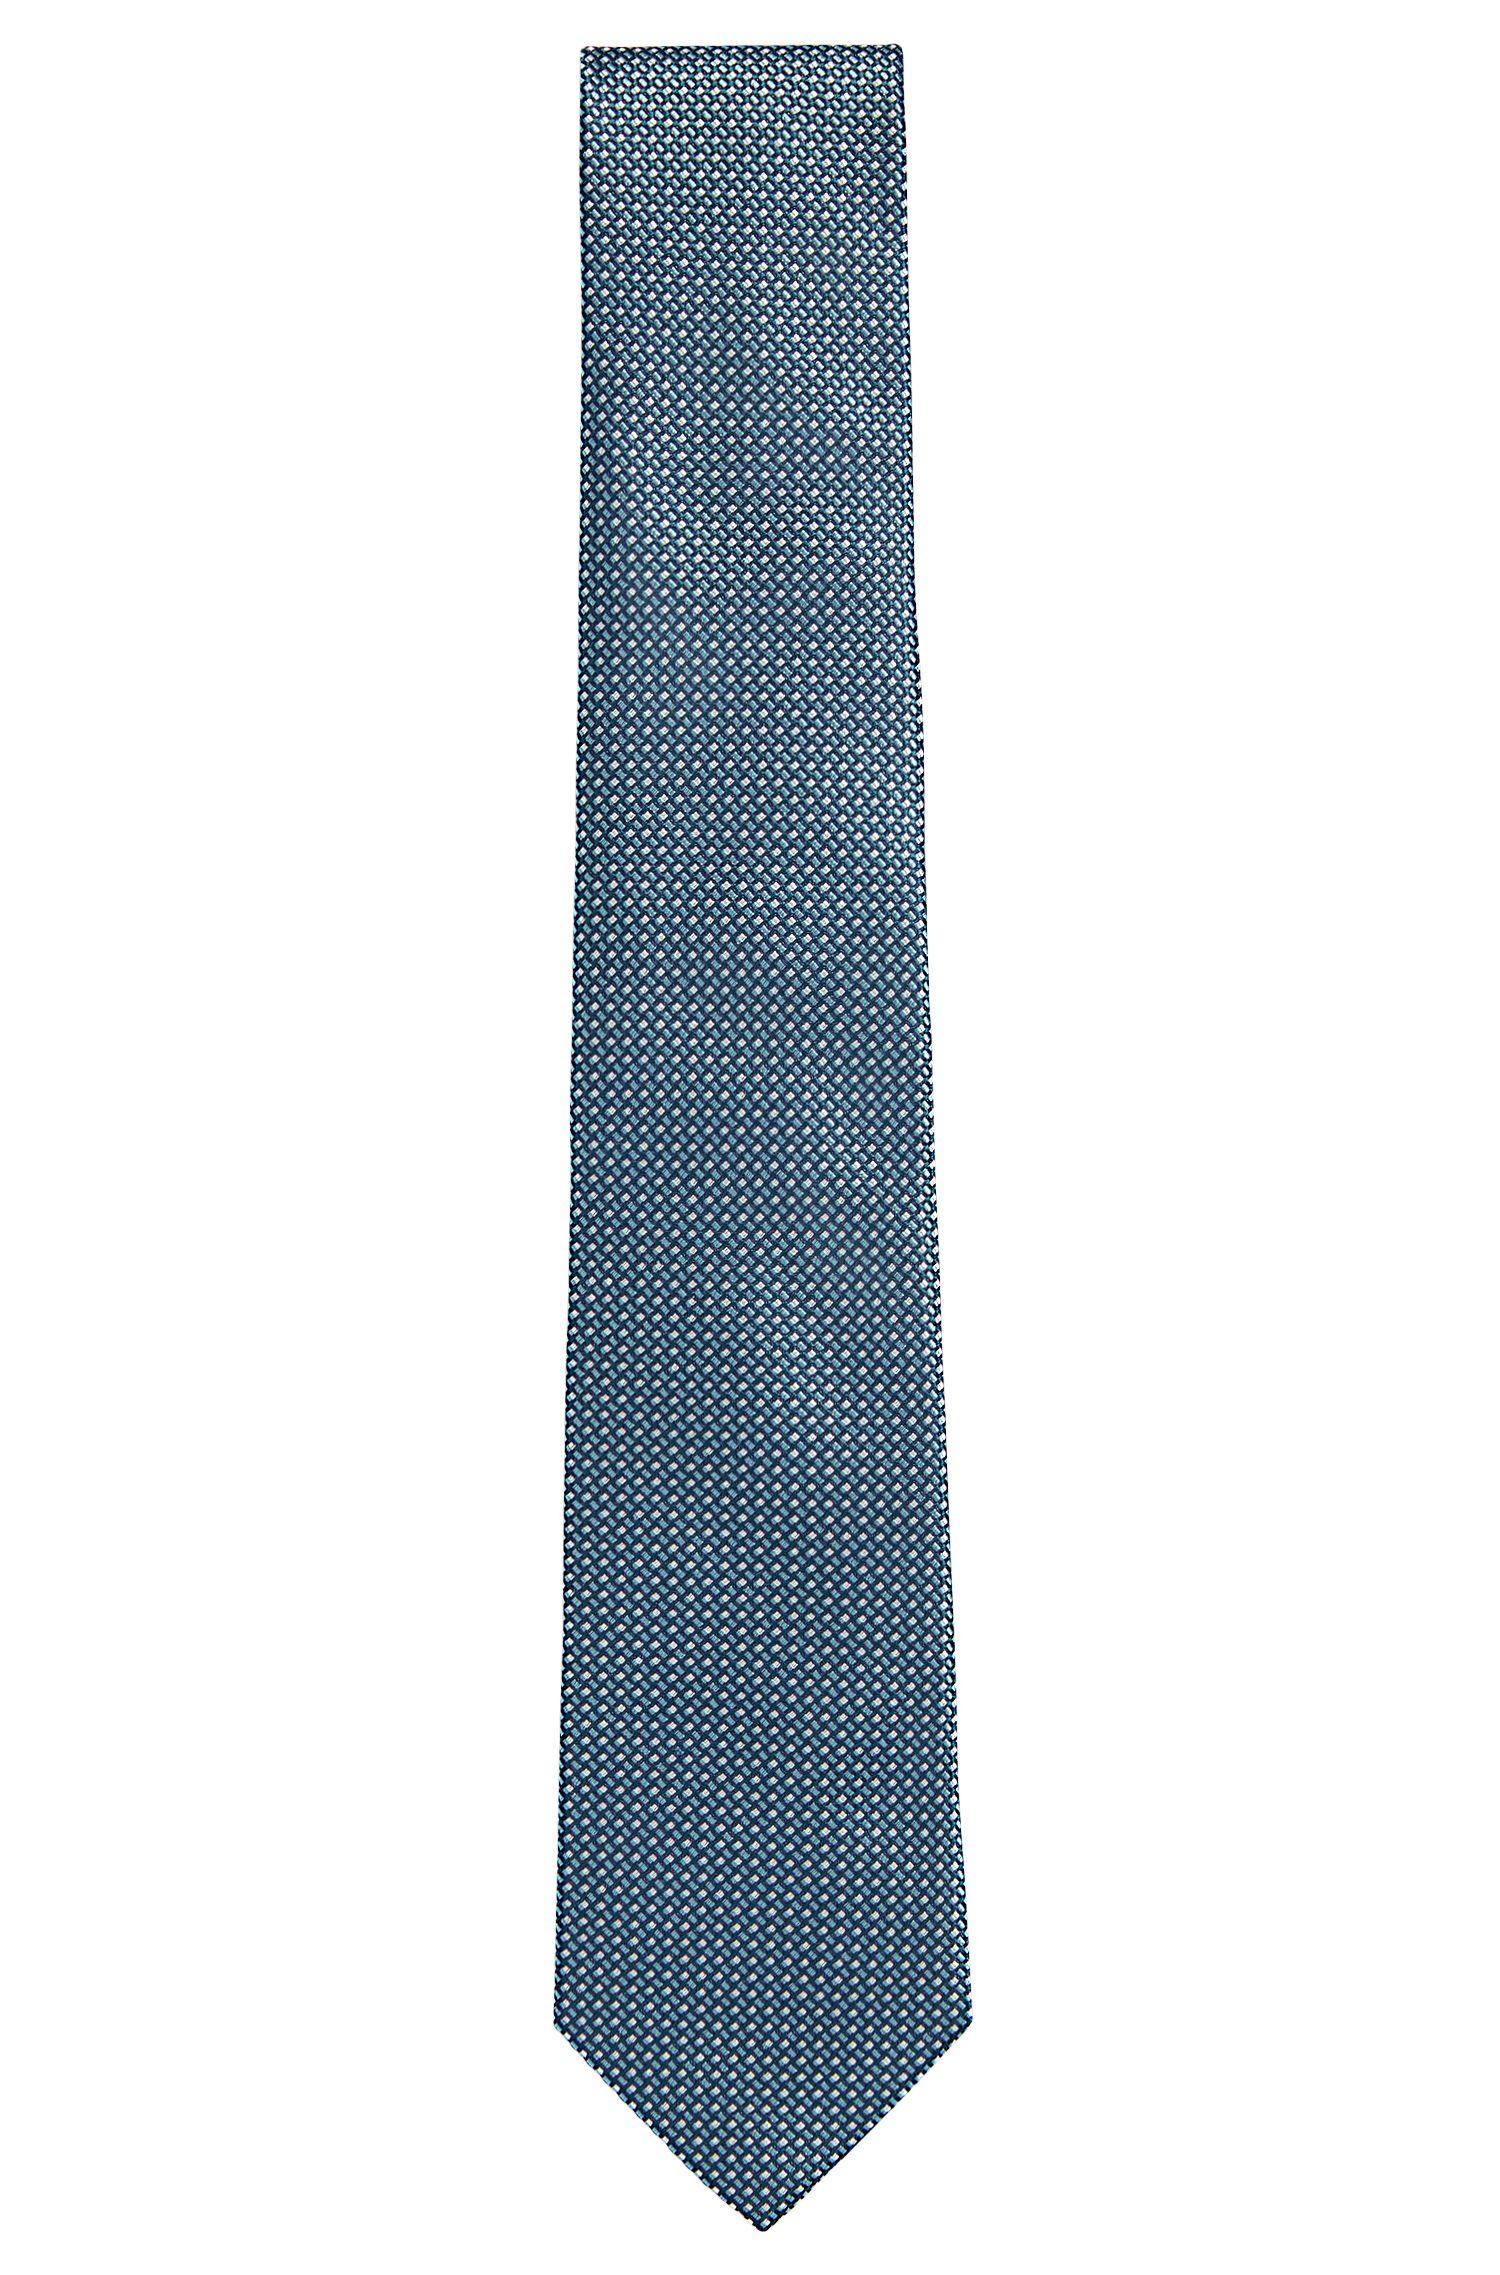 Patterned Silk Tie, Regular | Tie 7.5 cm, Open Green